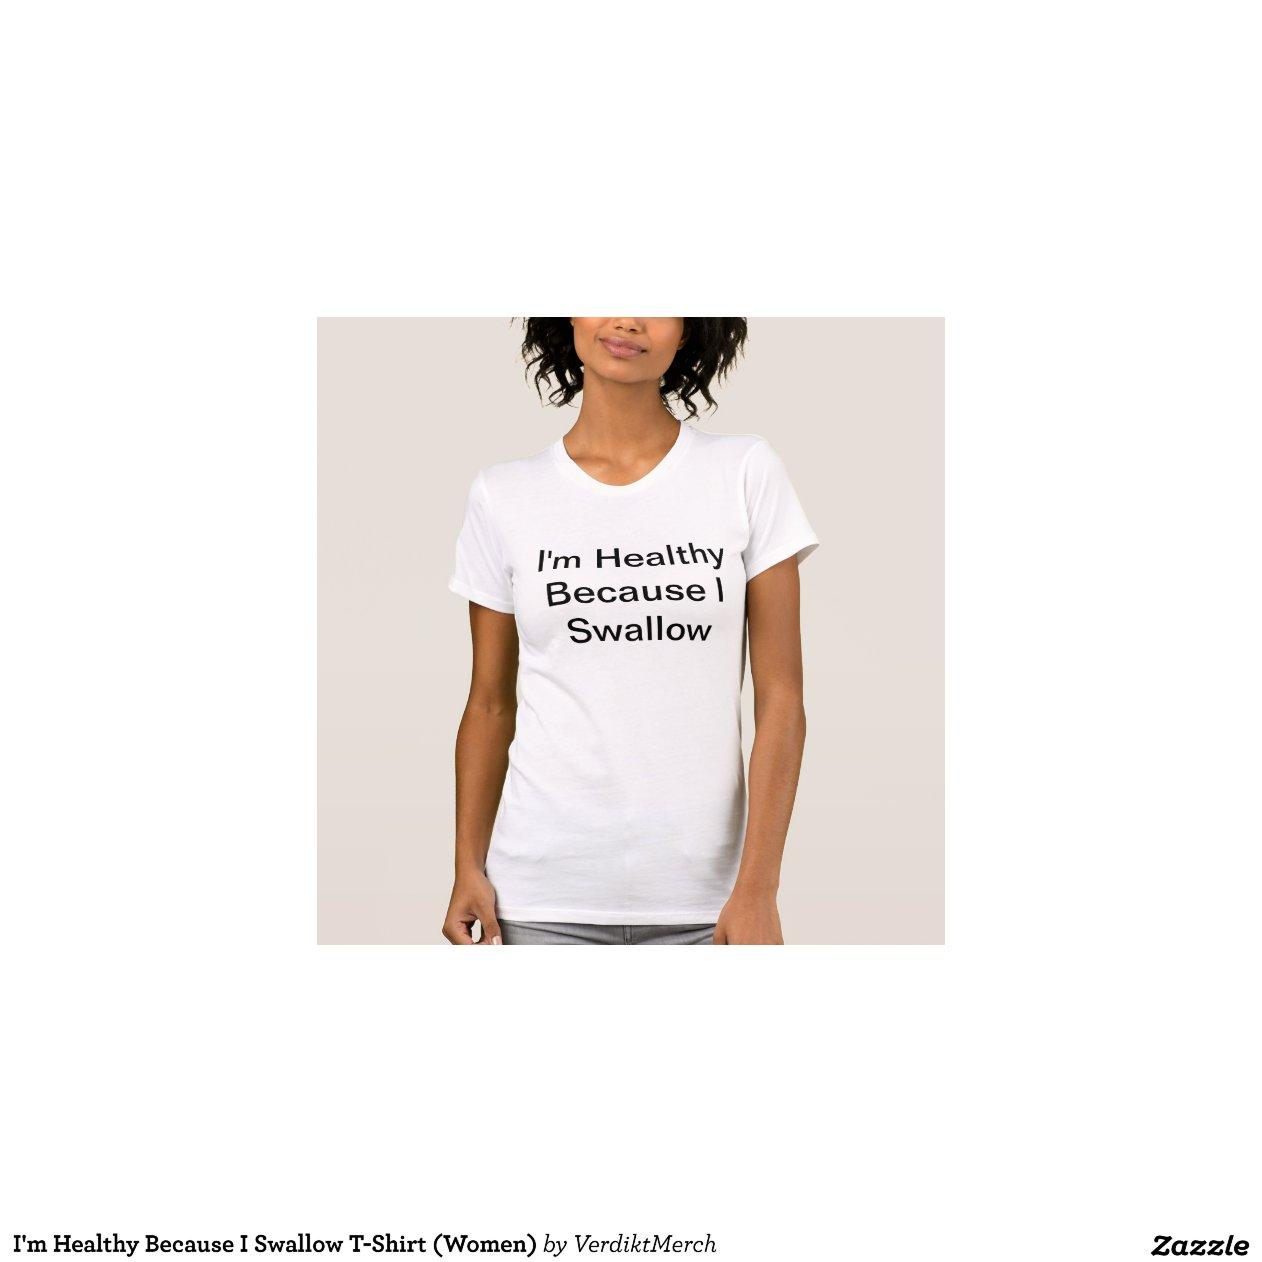 I Swallow Shirt 23